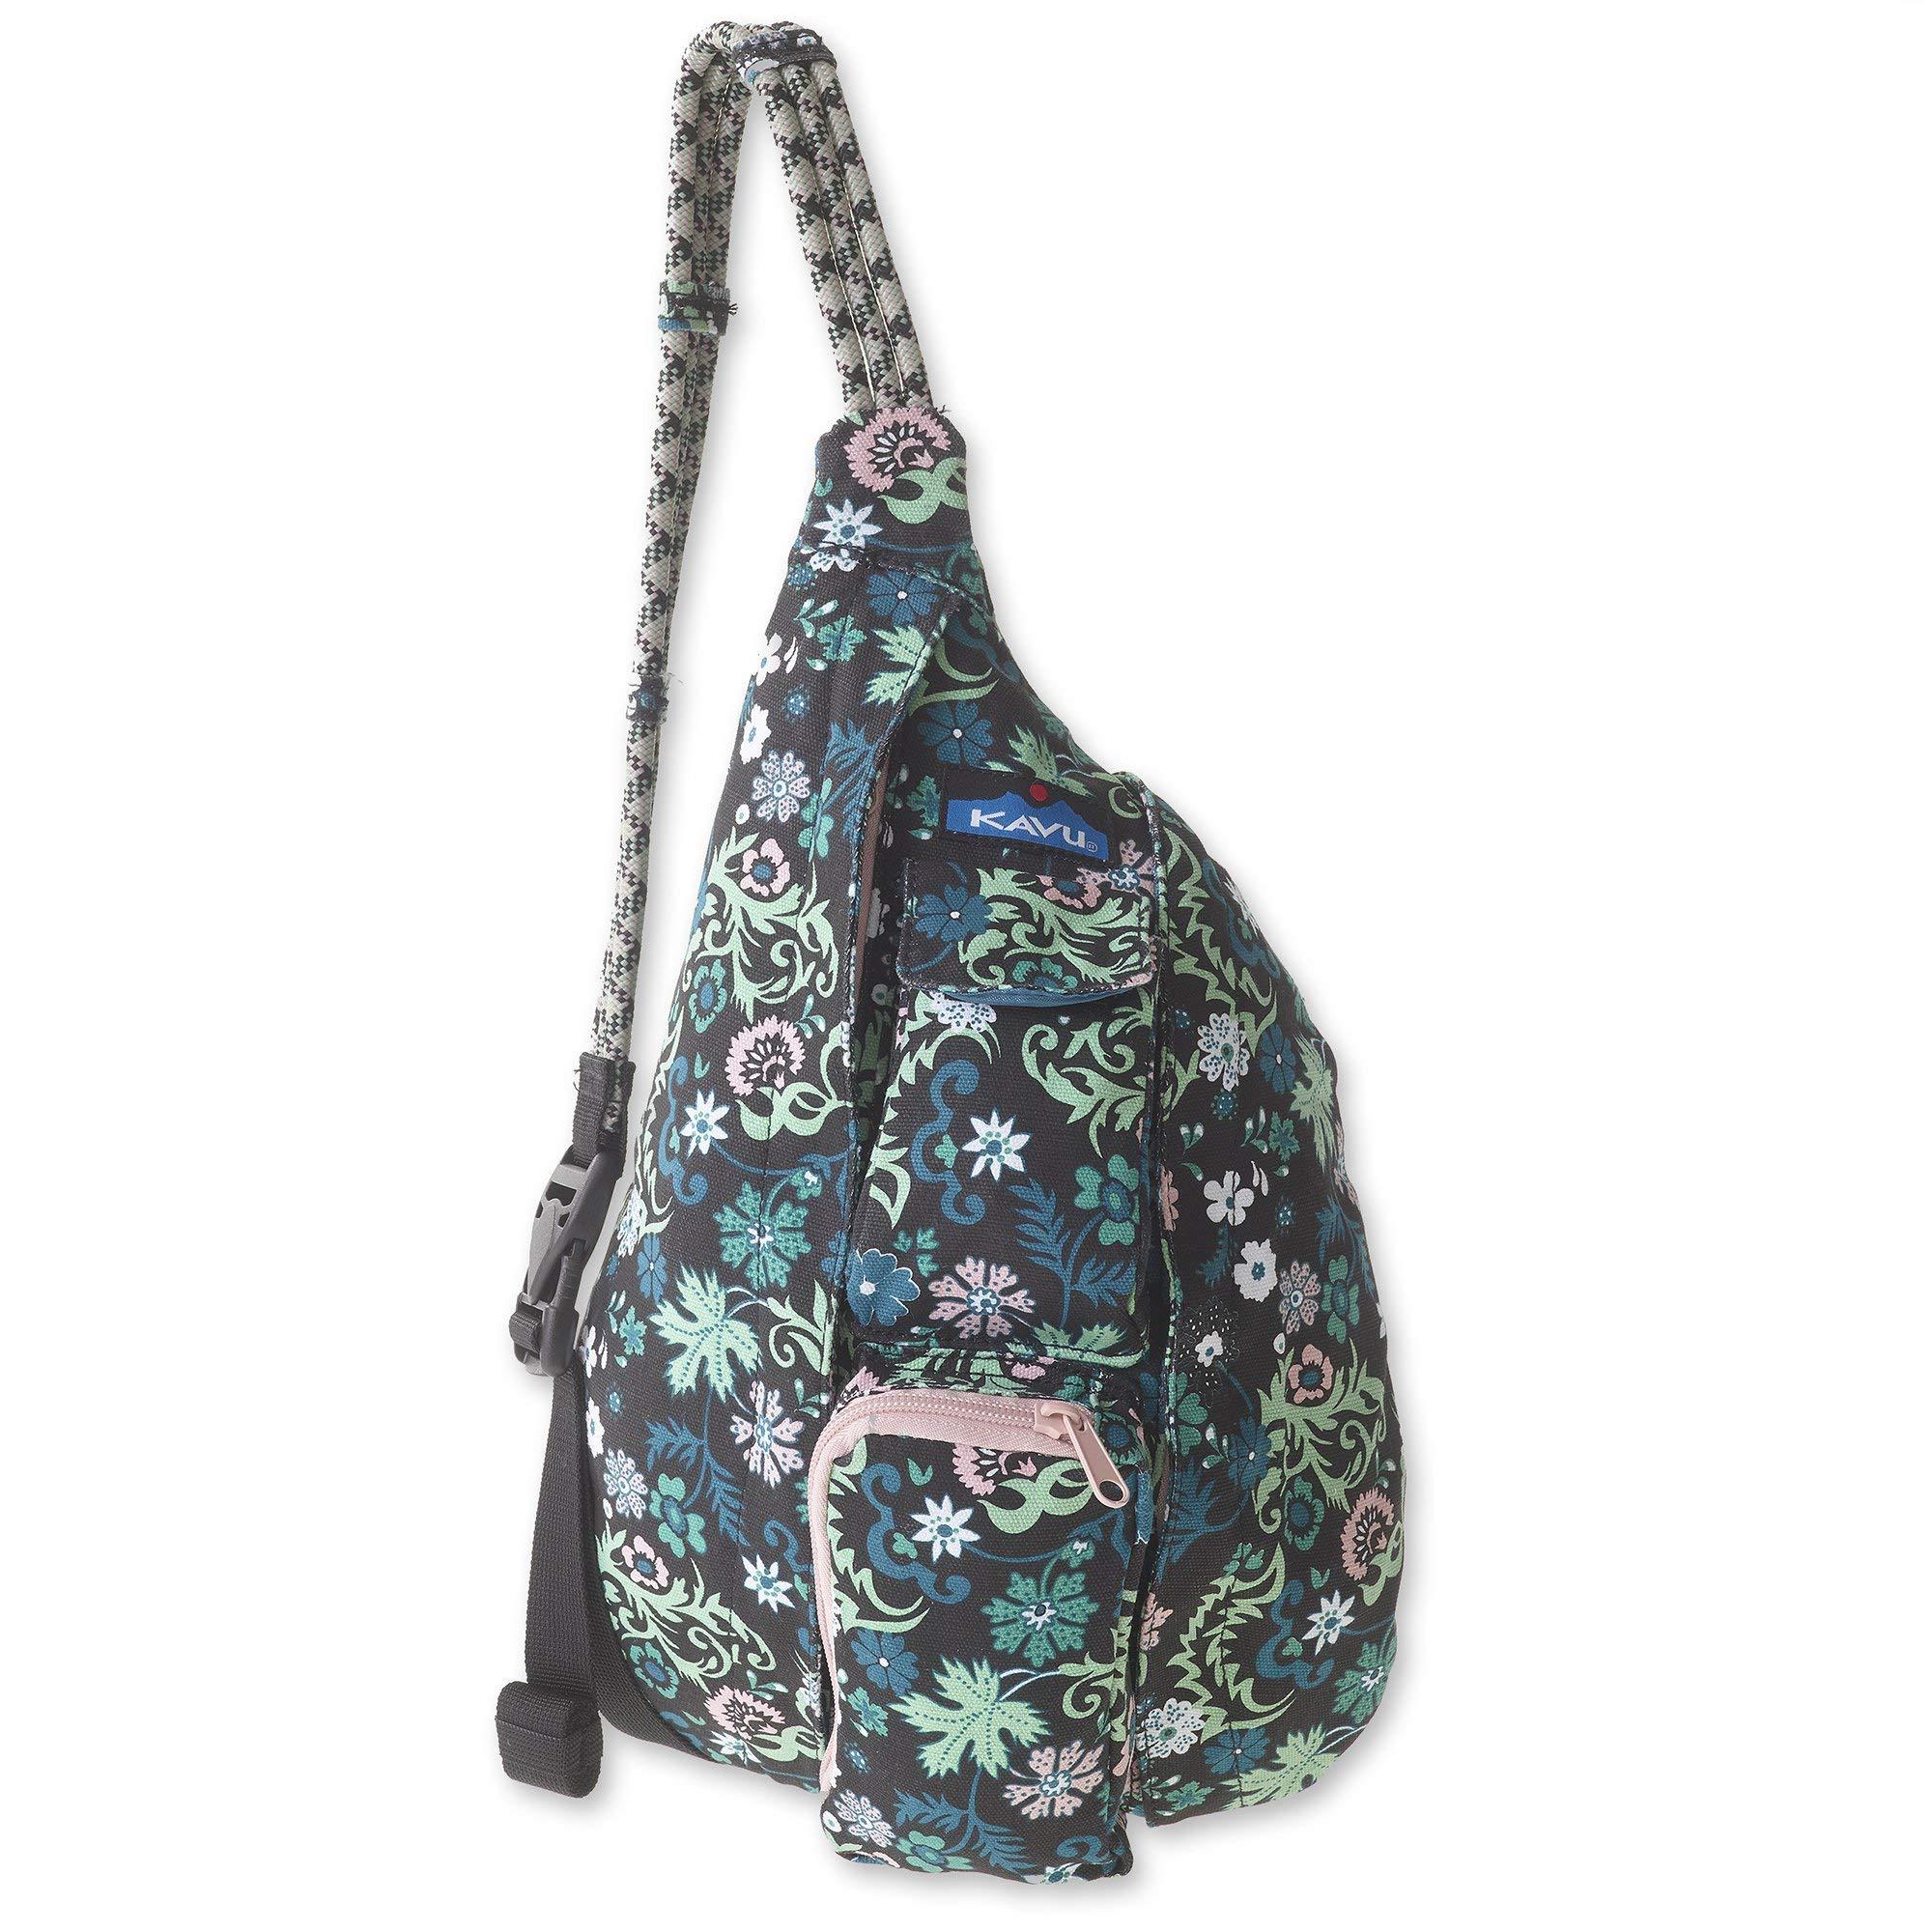 KAVU Mini Rope Bag Cotton Crossbody Sling Backpack  - Whimsical Meadow